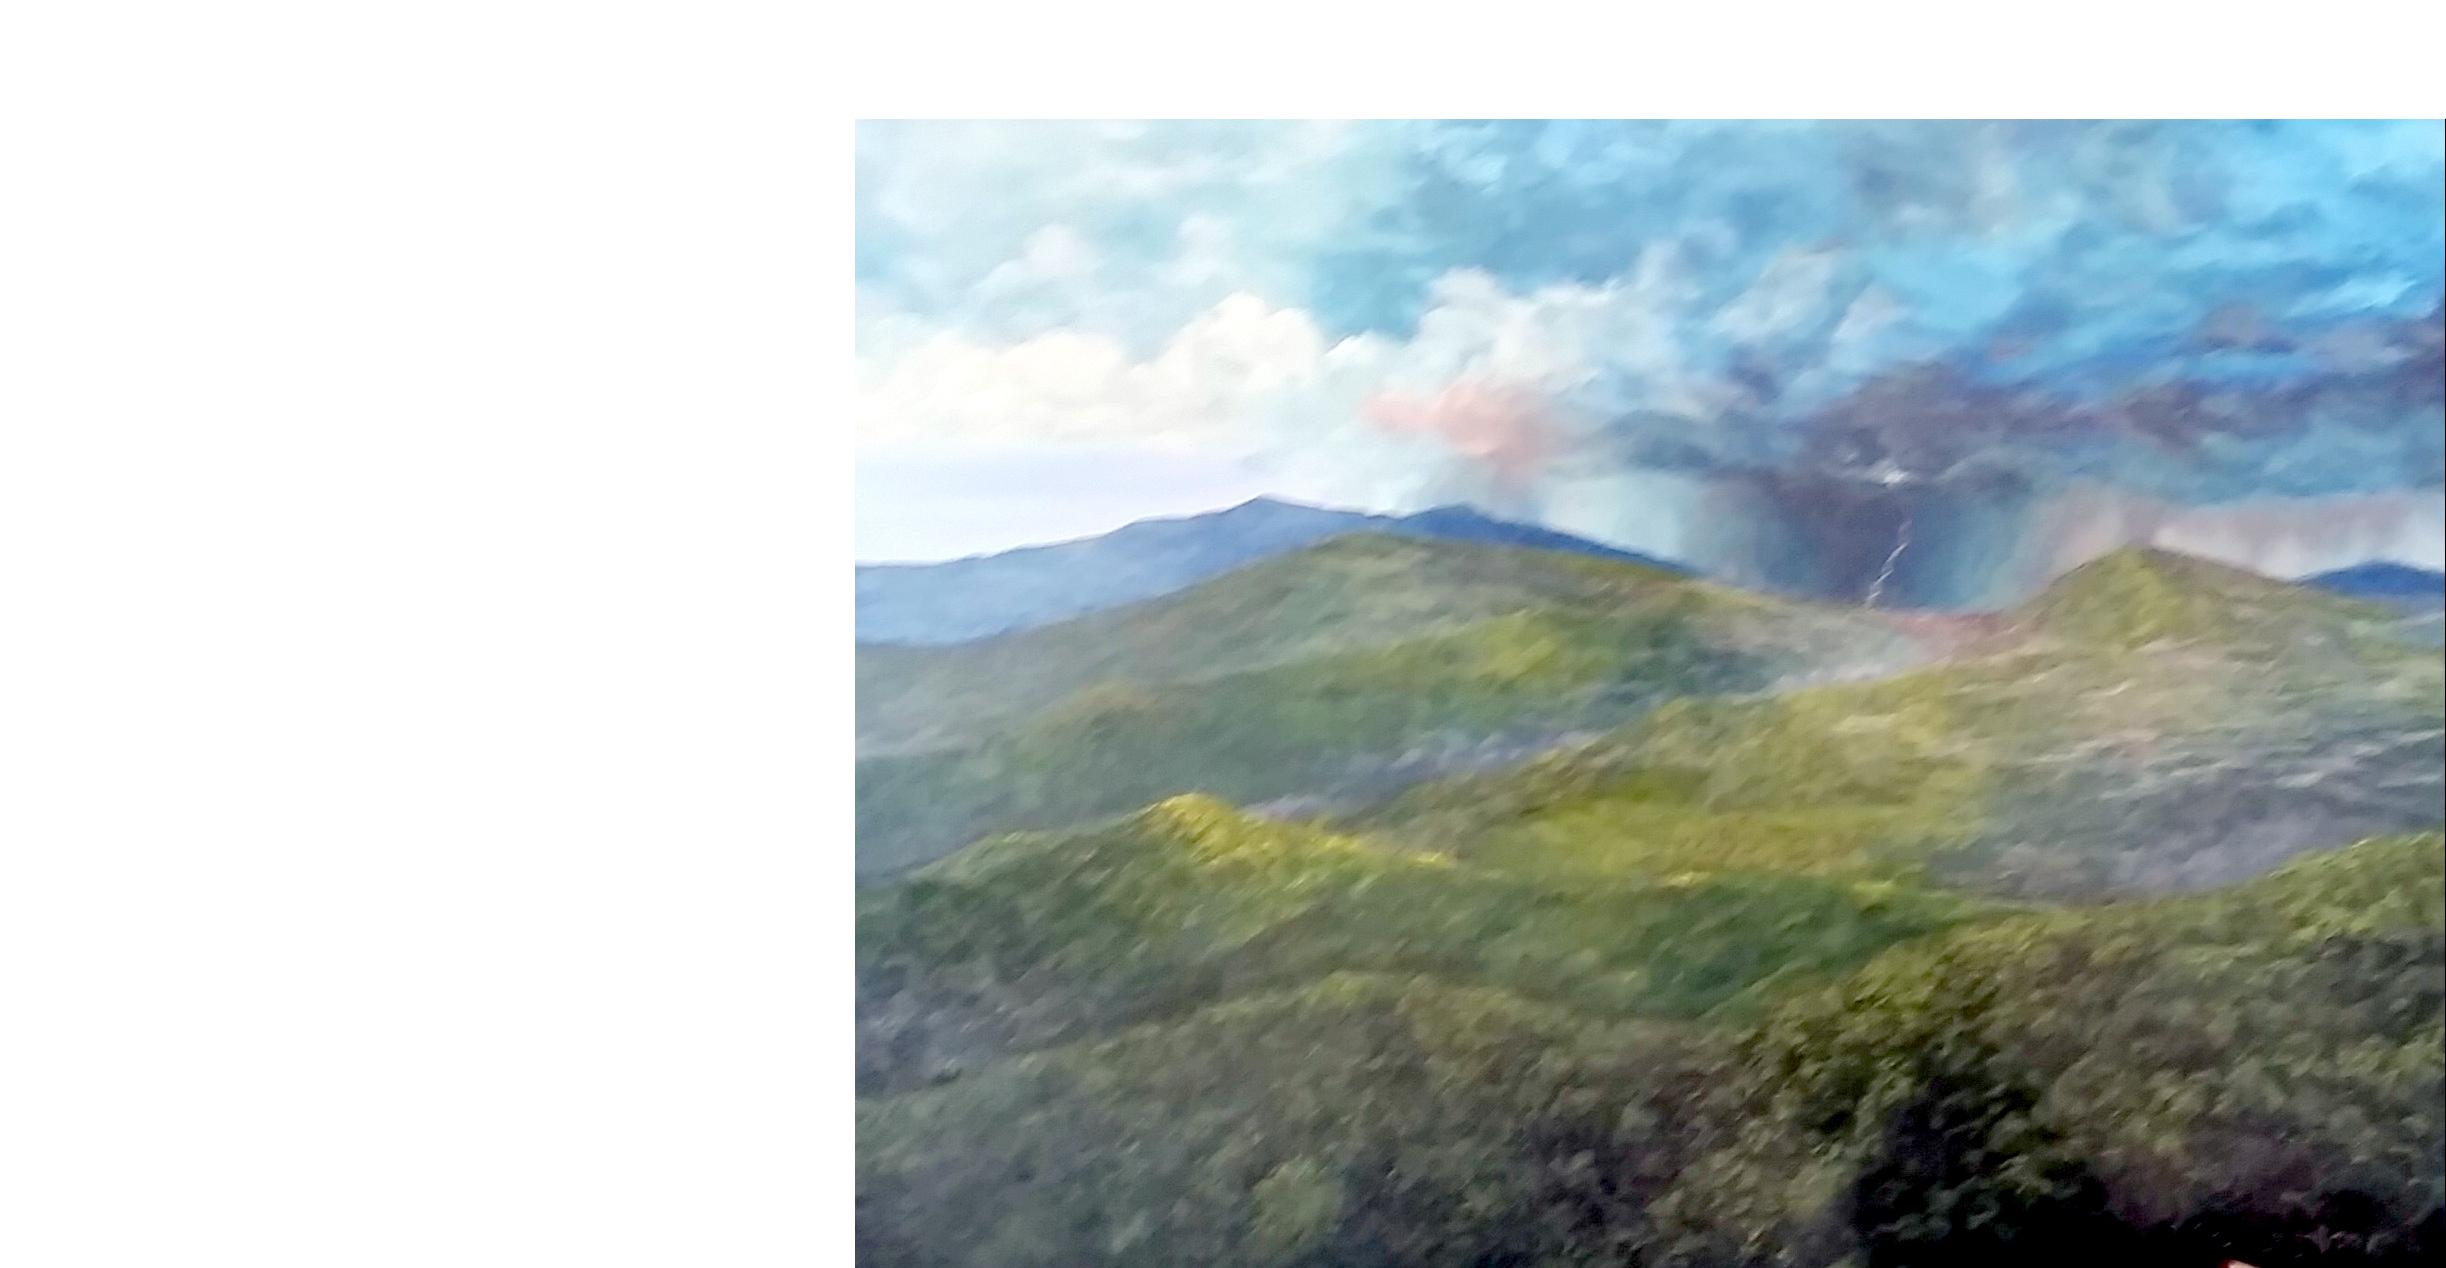 David Short, Altitude paintings, Contemporary Artist, Realist painter, trains, mountains, Milky Way, Ireland, oil paintings, original art, Virginia Artist, local RVA artist